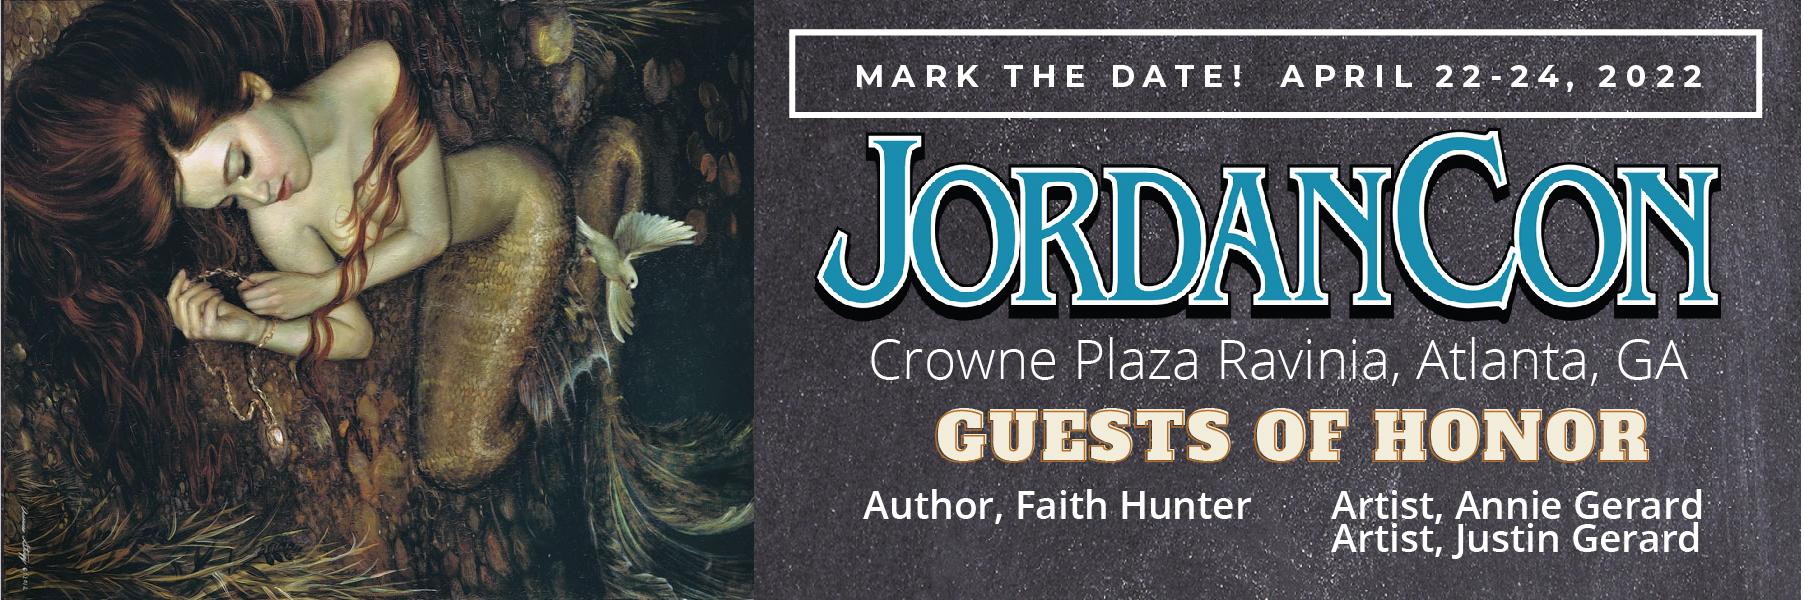 July 16-18, 2021 at the Crowne Plaza Ravinia in Atlanta, Georgia